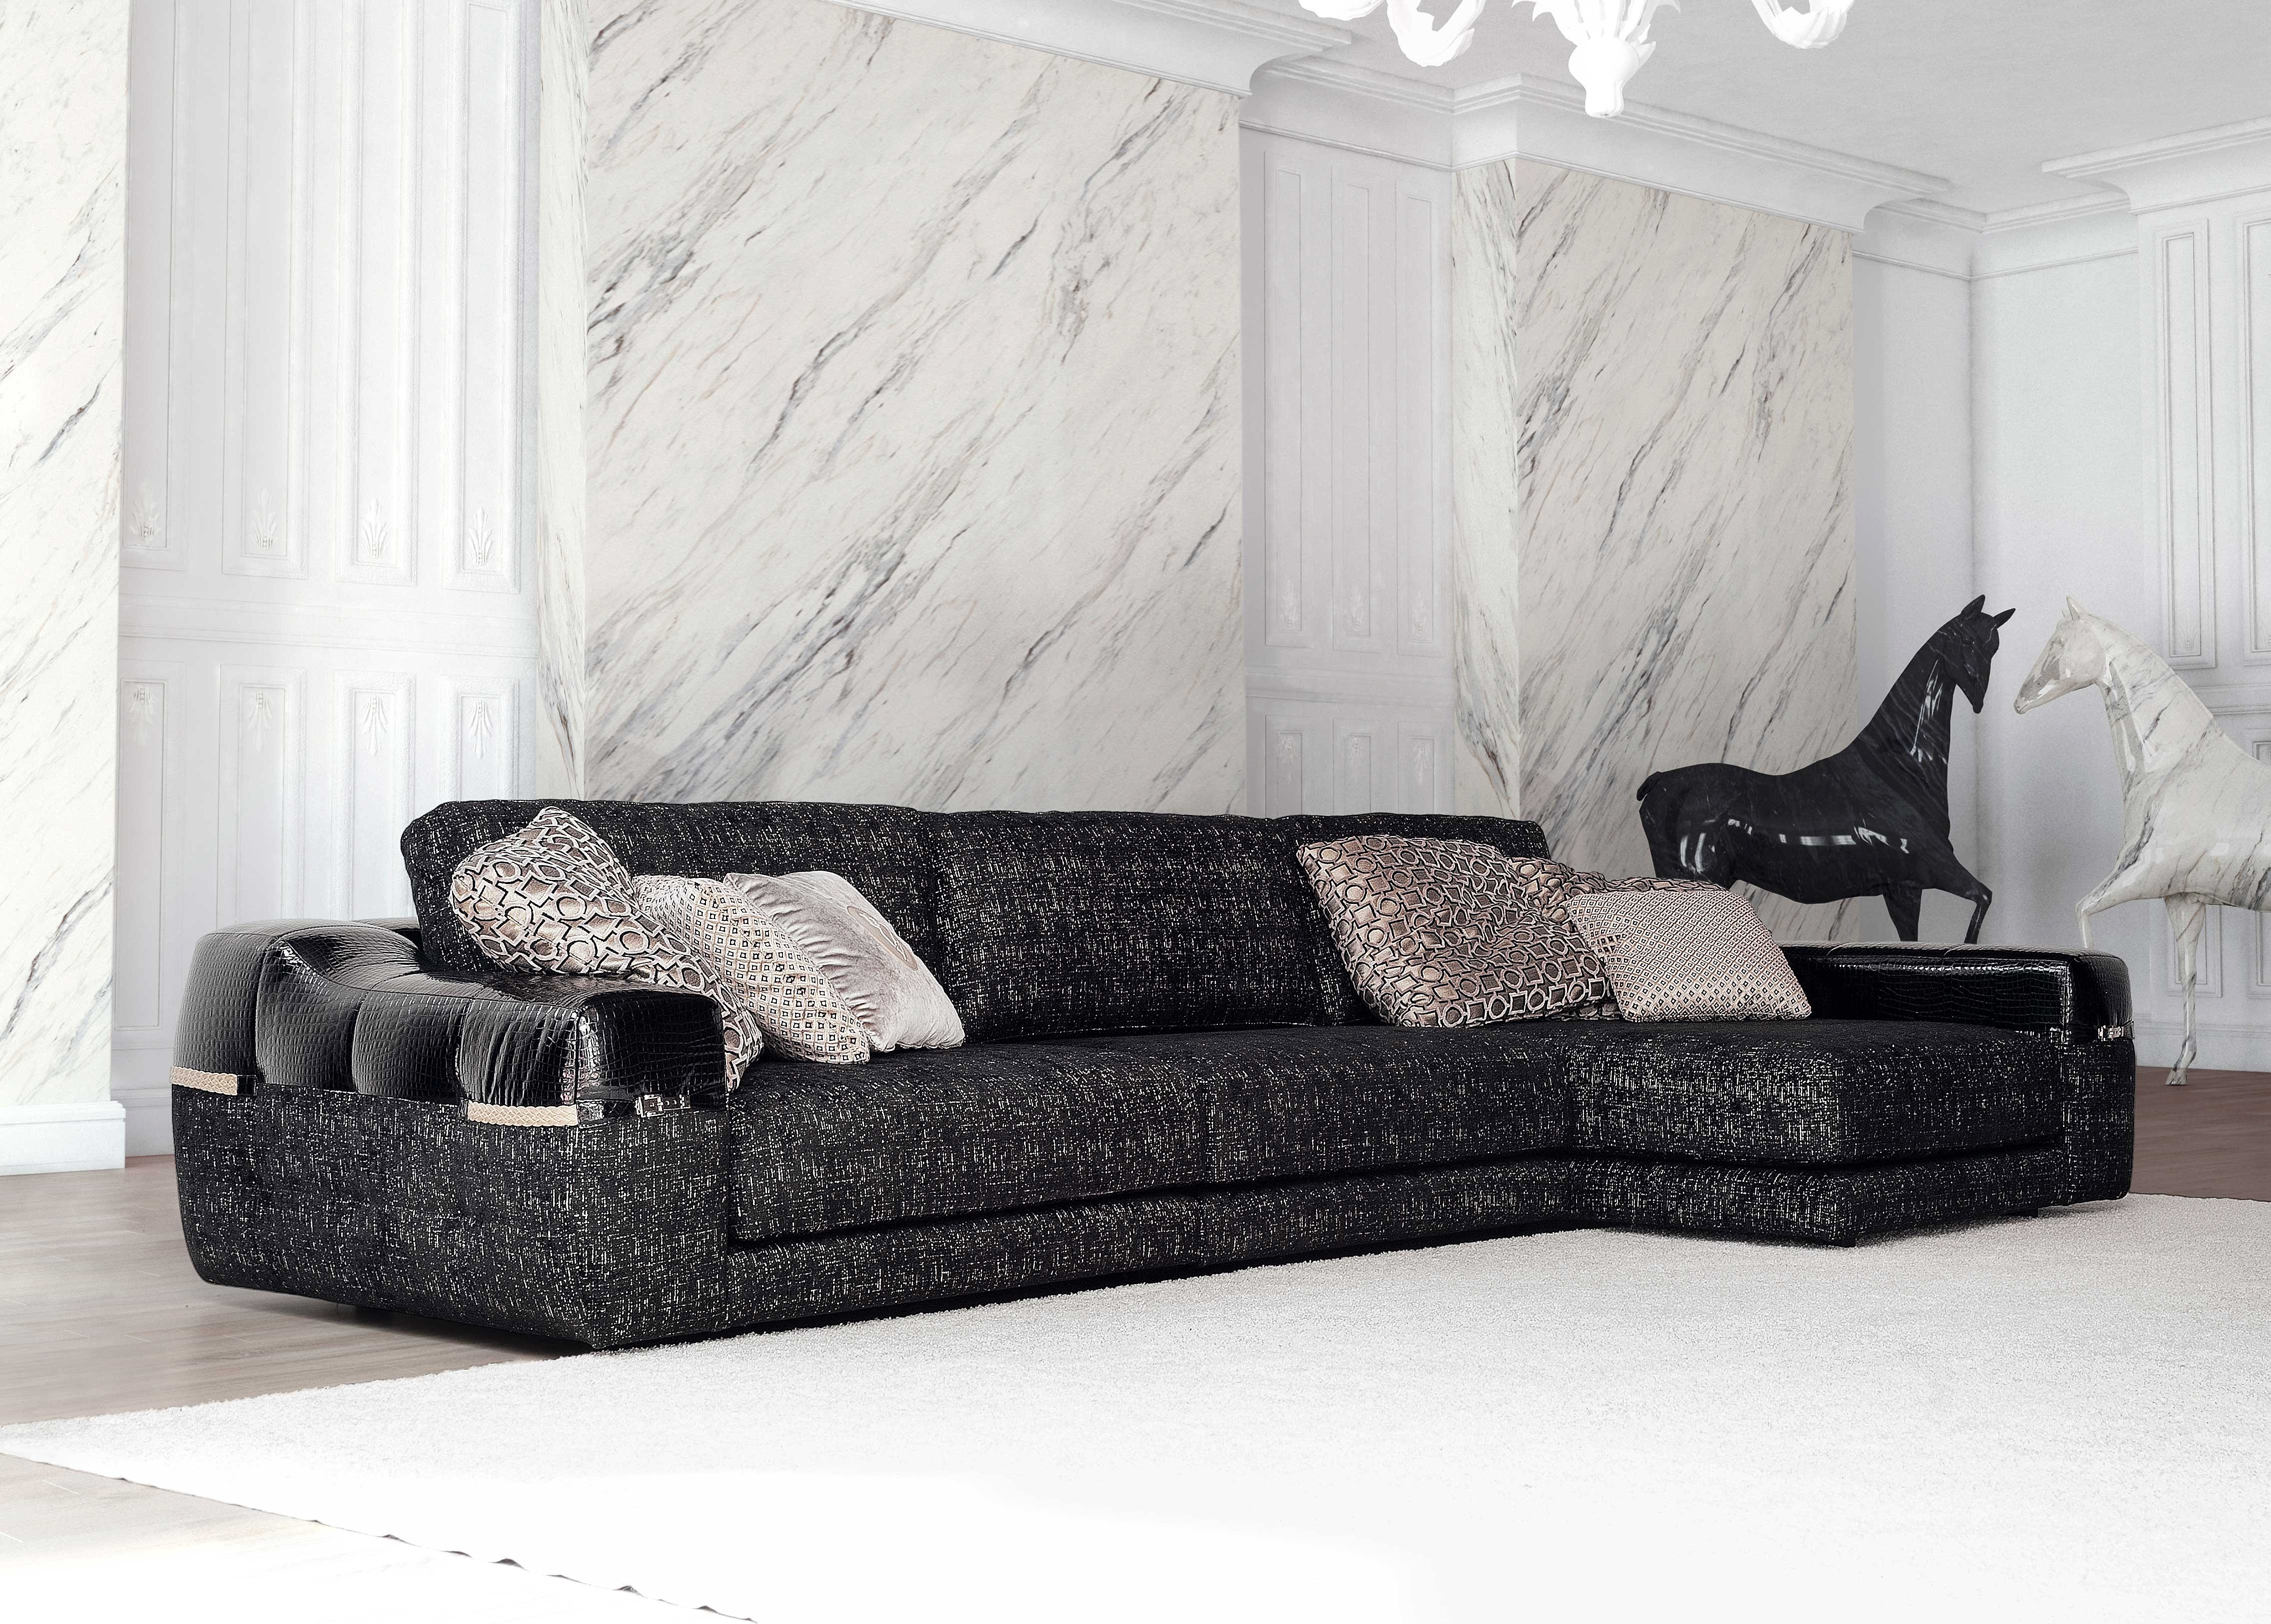 Big sofass marbella sof s en marbella colchones en marbella 1731 - Sofas en marbella ...